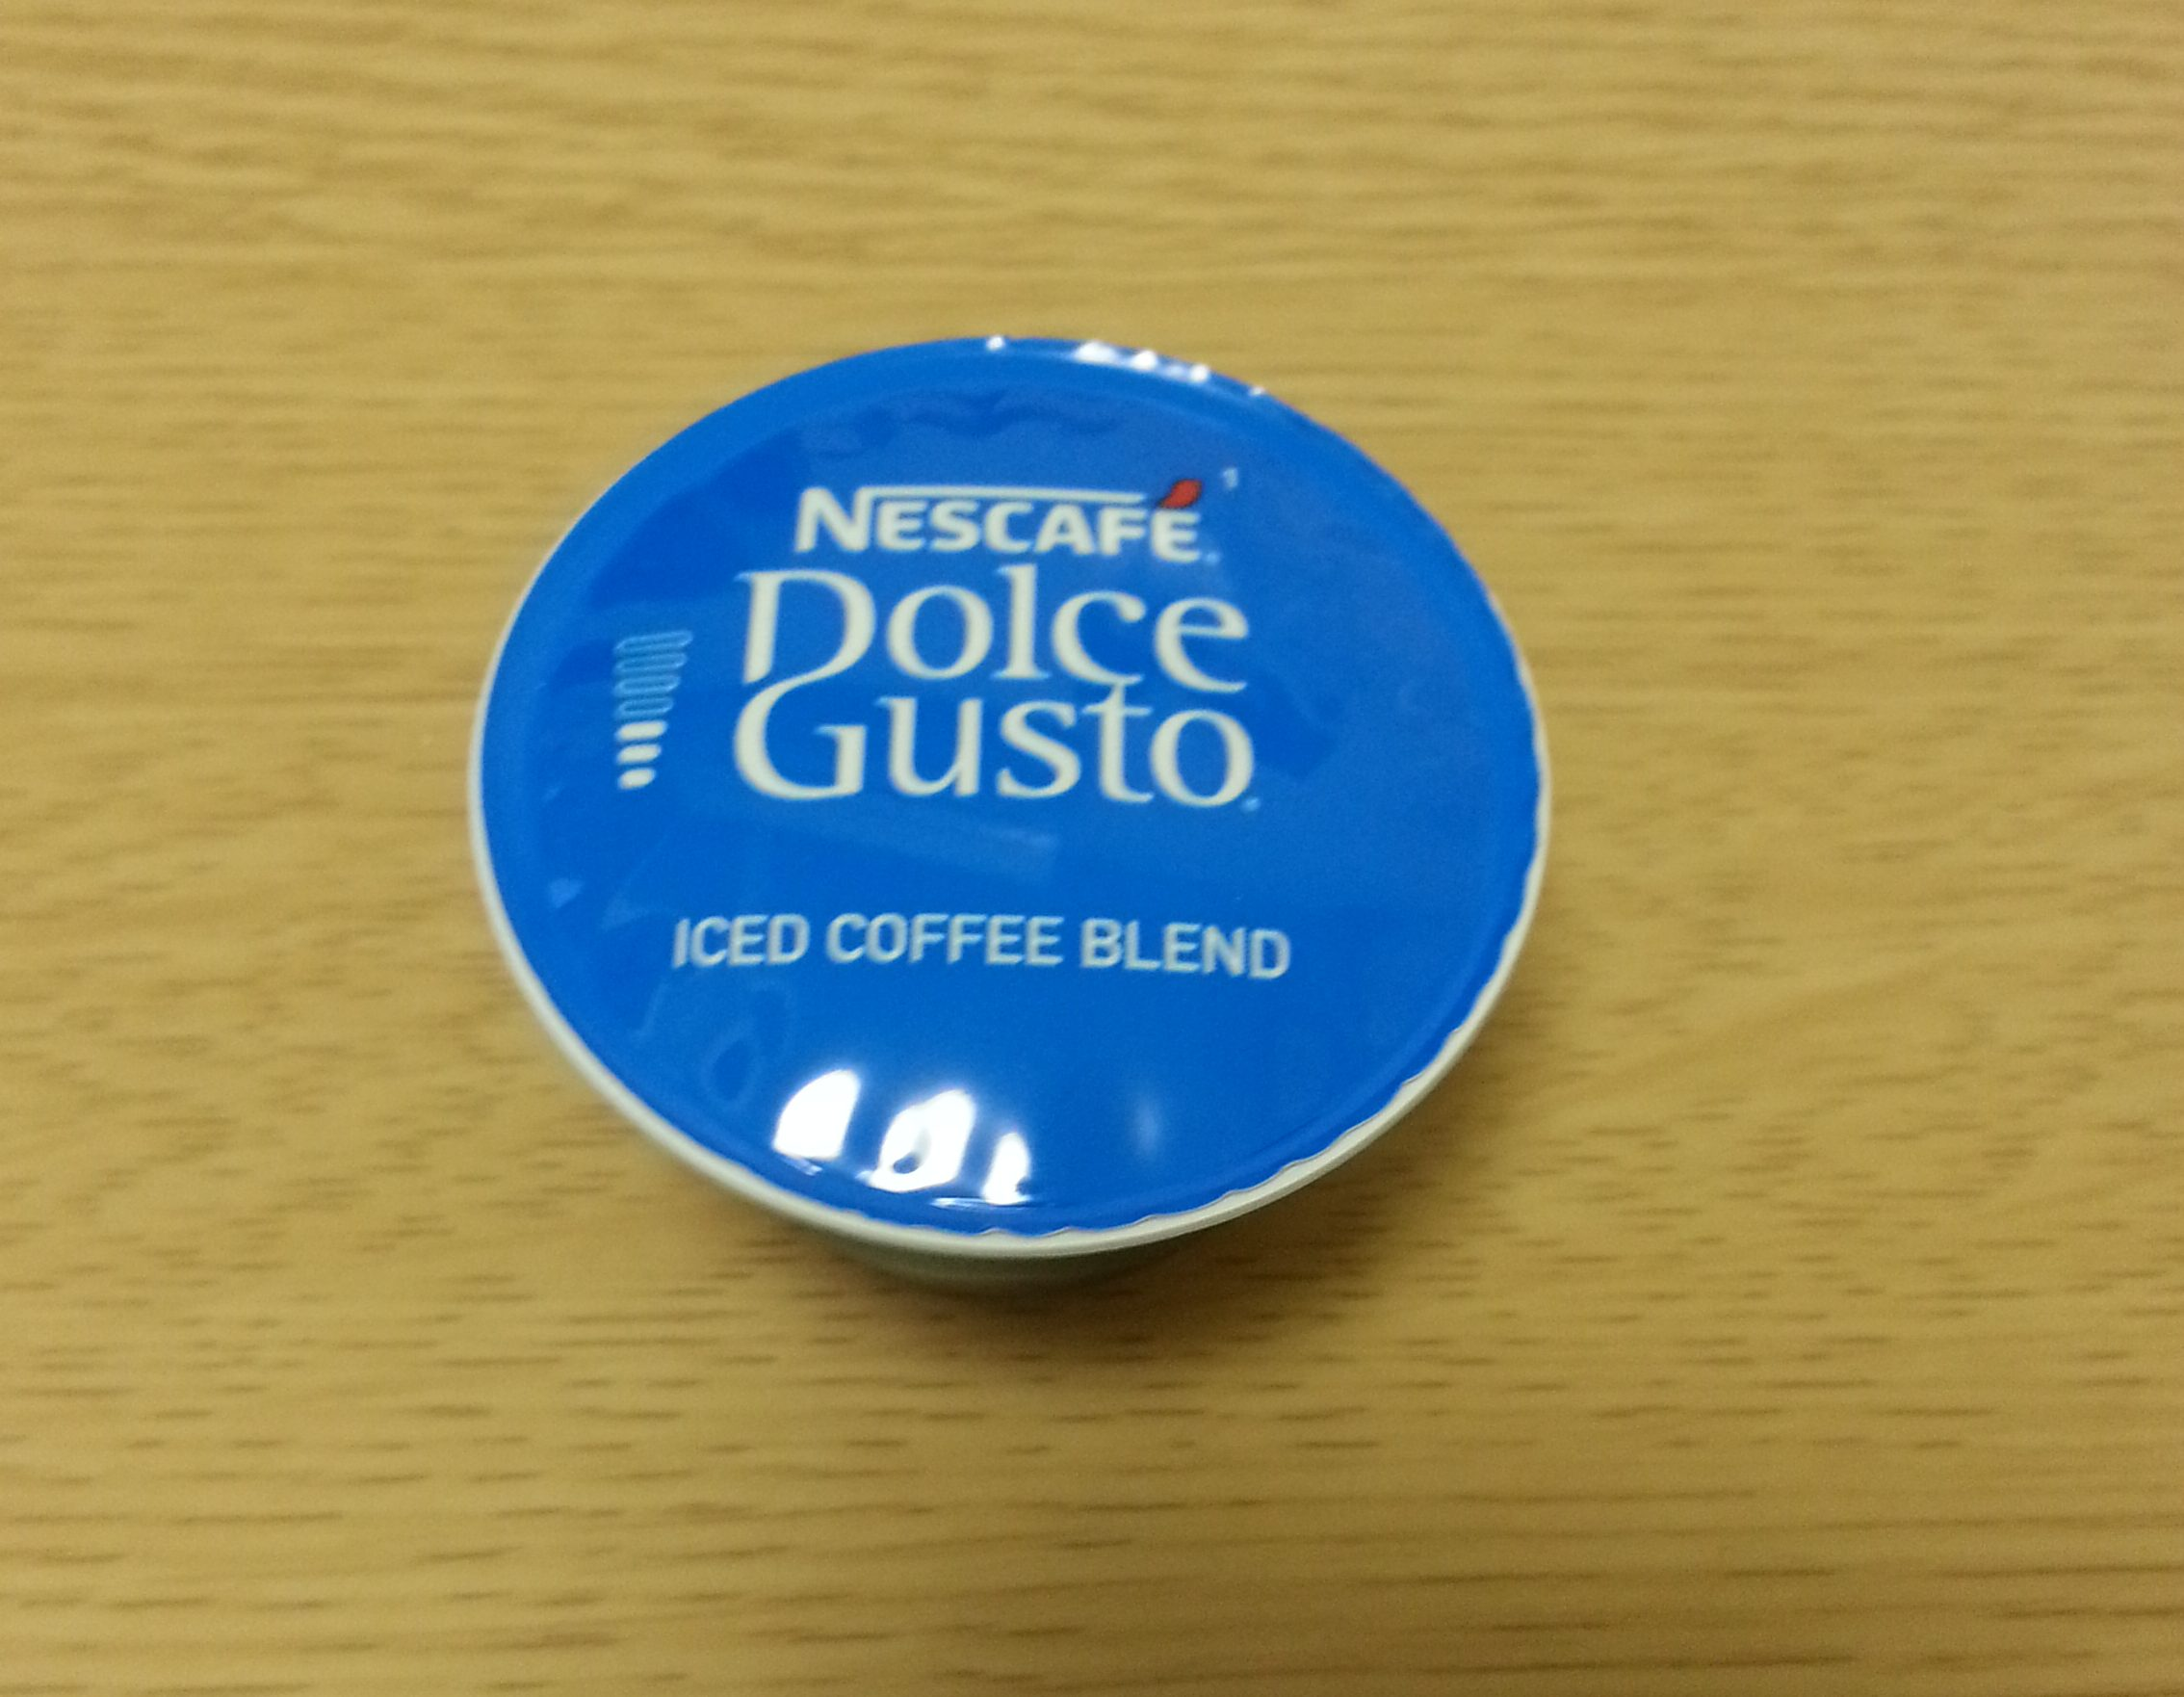 nescafe-dolcegusto-icecoffee1